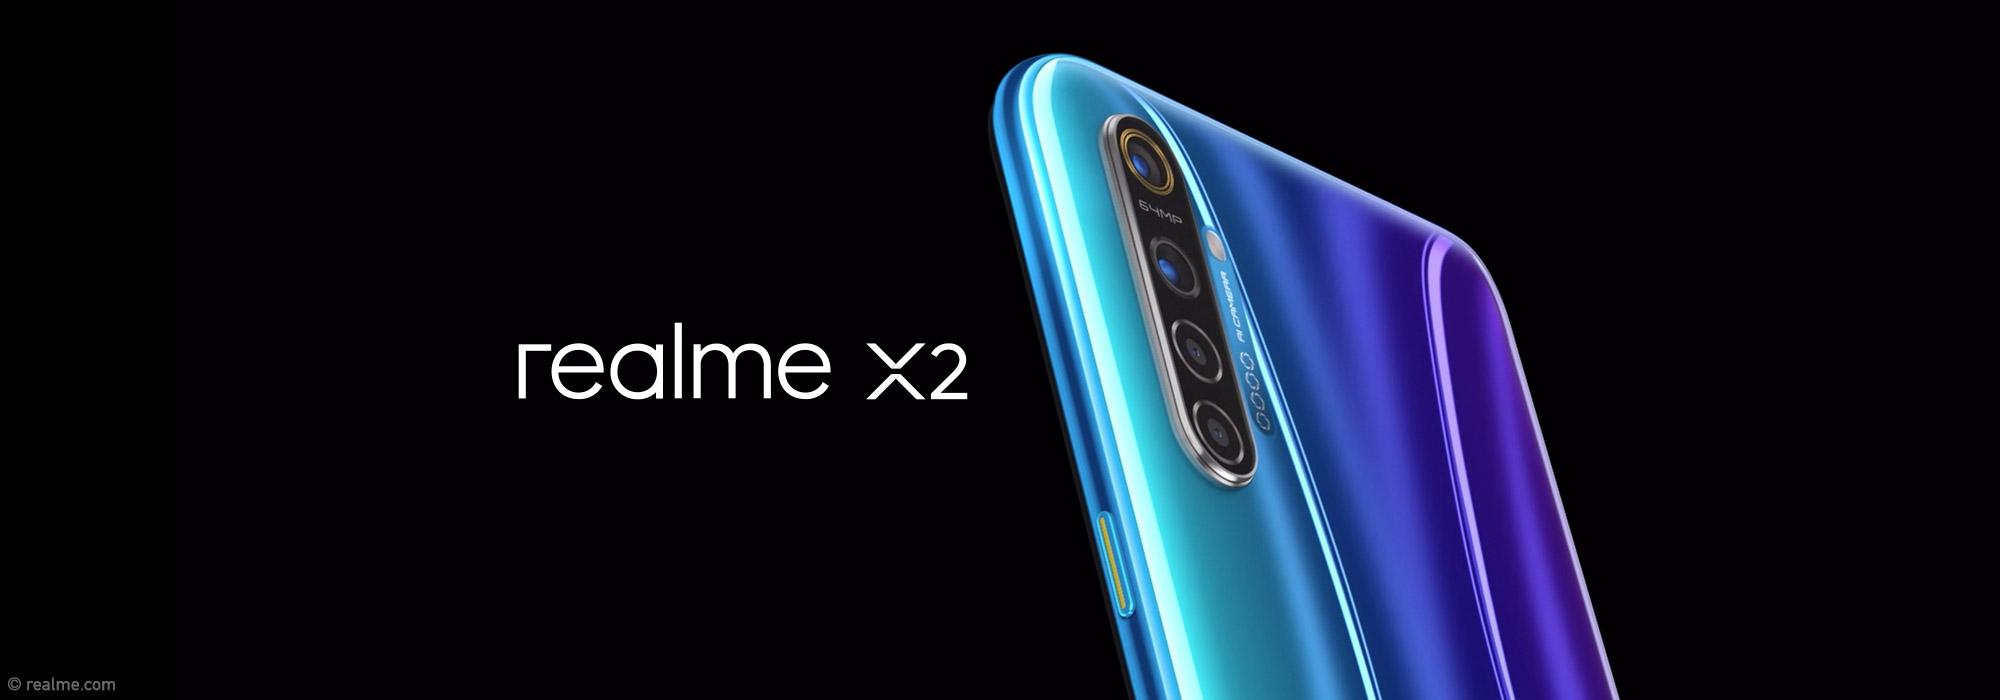 Realme X2 – hochgradig konkurrenzfähig in seiner Klasse